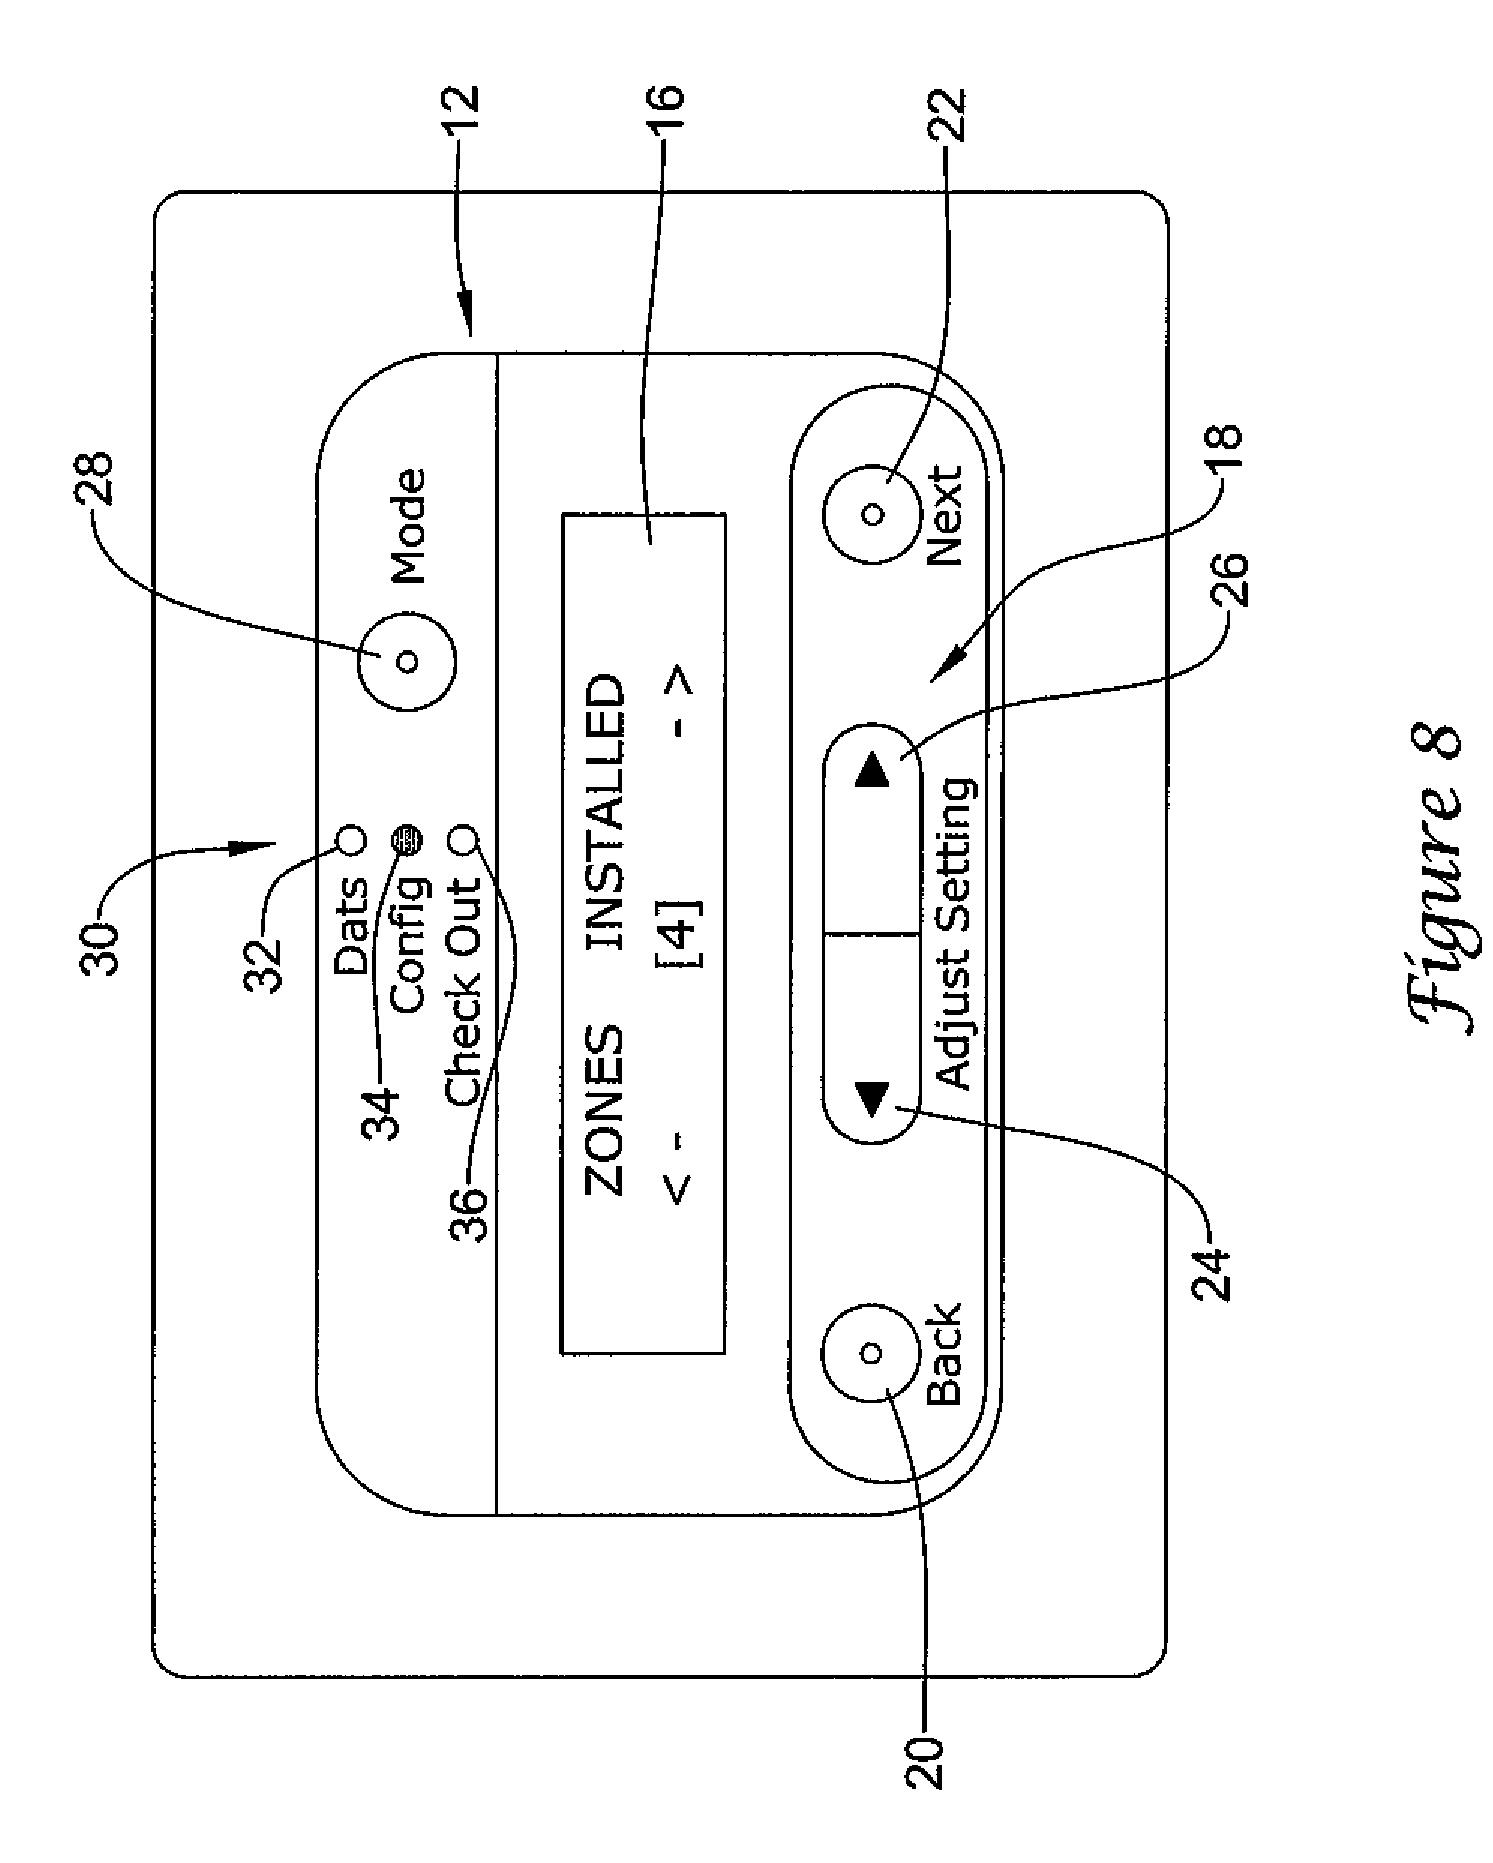 Jackson Hvac Zone Wiring Diagram Engine Control Basic Patent Us7558648 Panel With Configuration Rh Google Com Pg Color Motor Diagrams